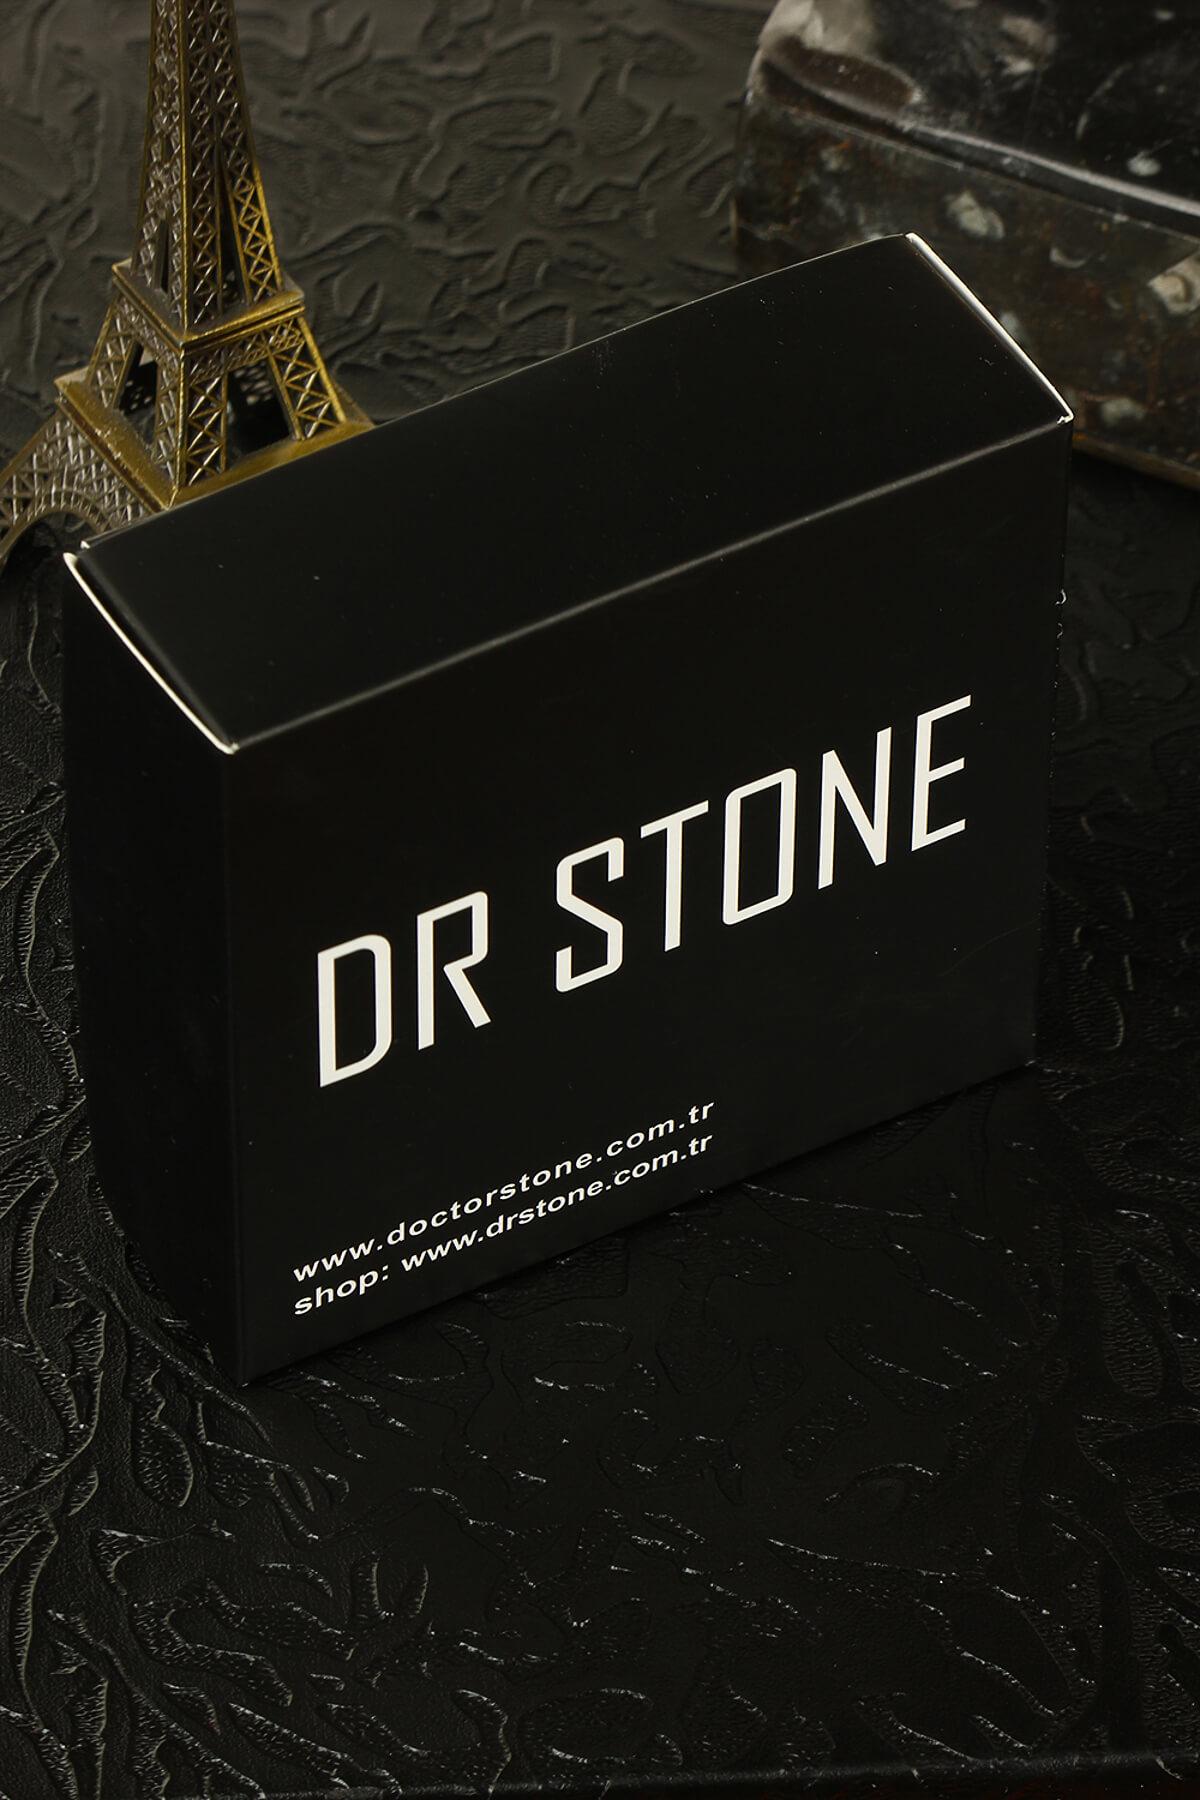 Dr. Stone Kadın Doğaltaş Akik Kolye 121Ar34 2